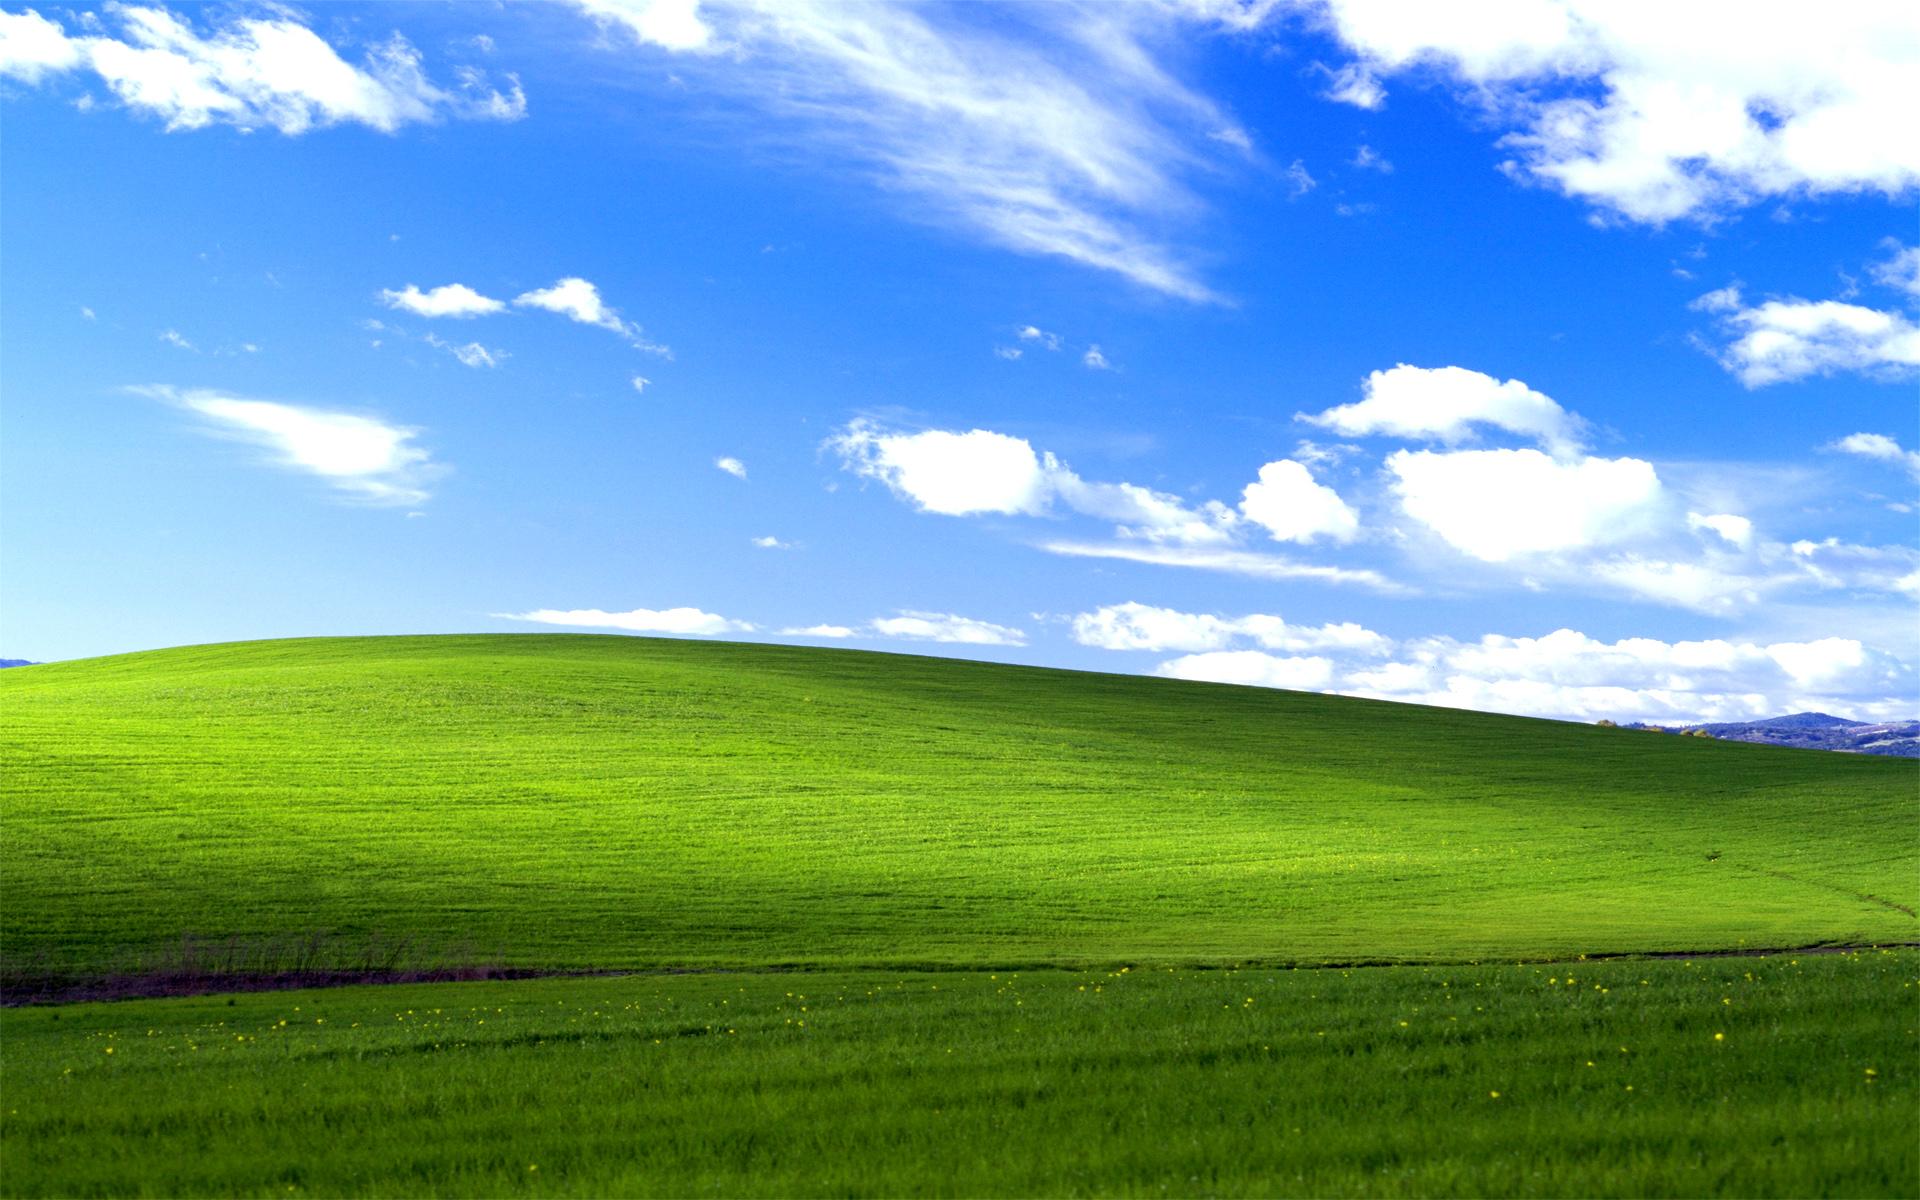 Addio a Windows XP